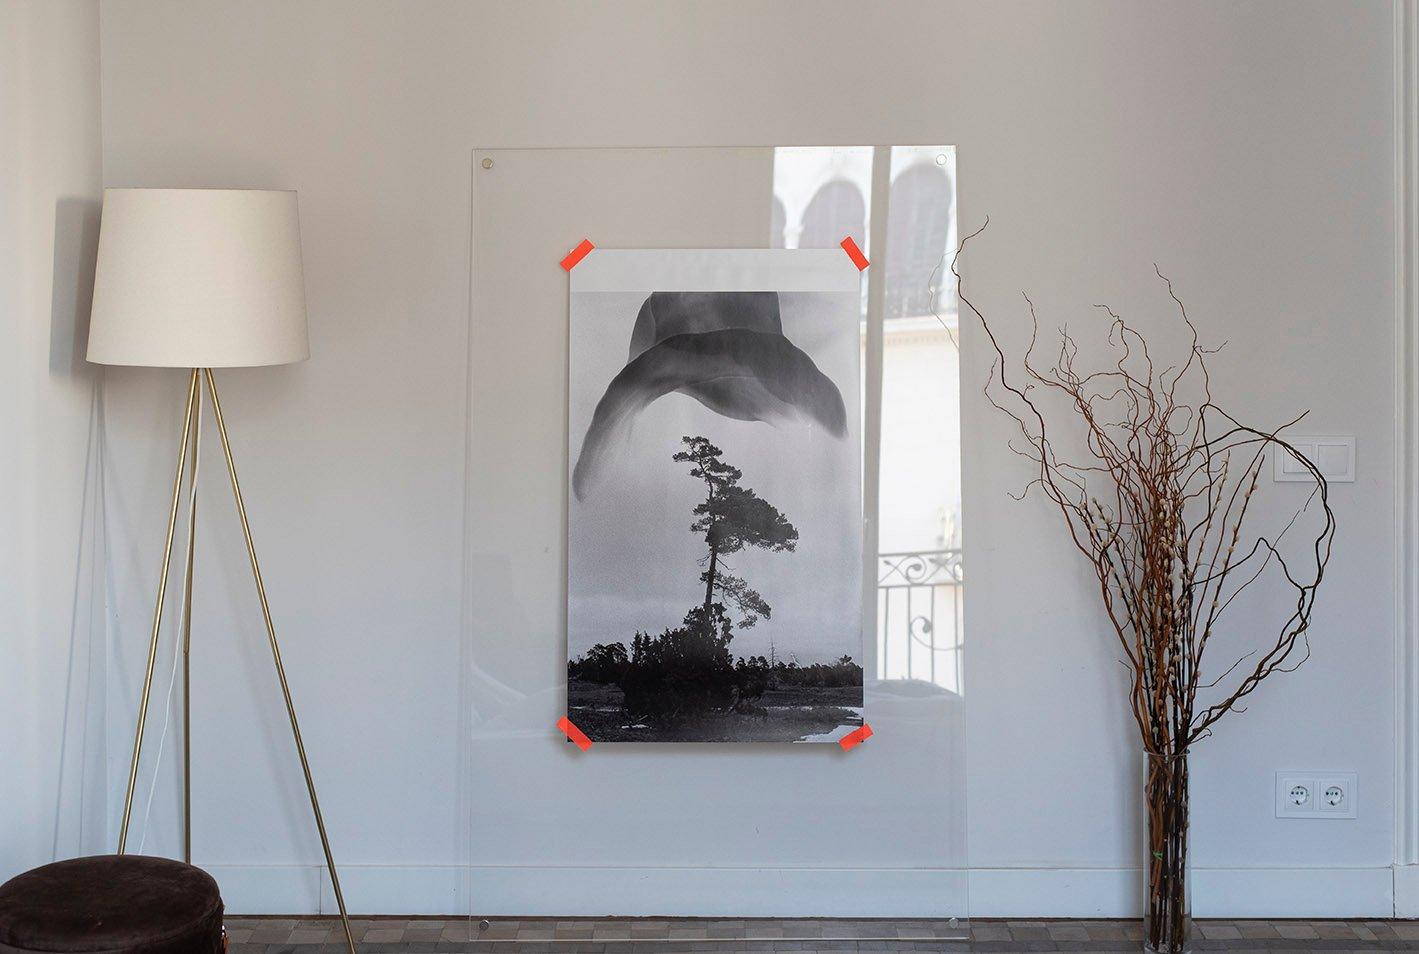 Image of Dada frame